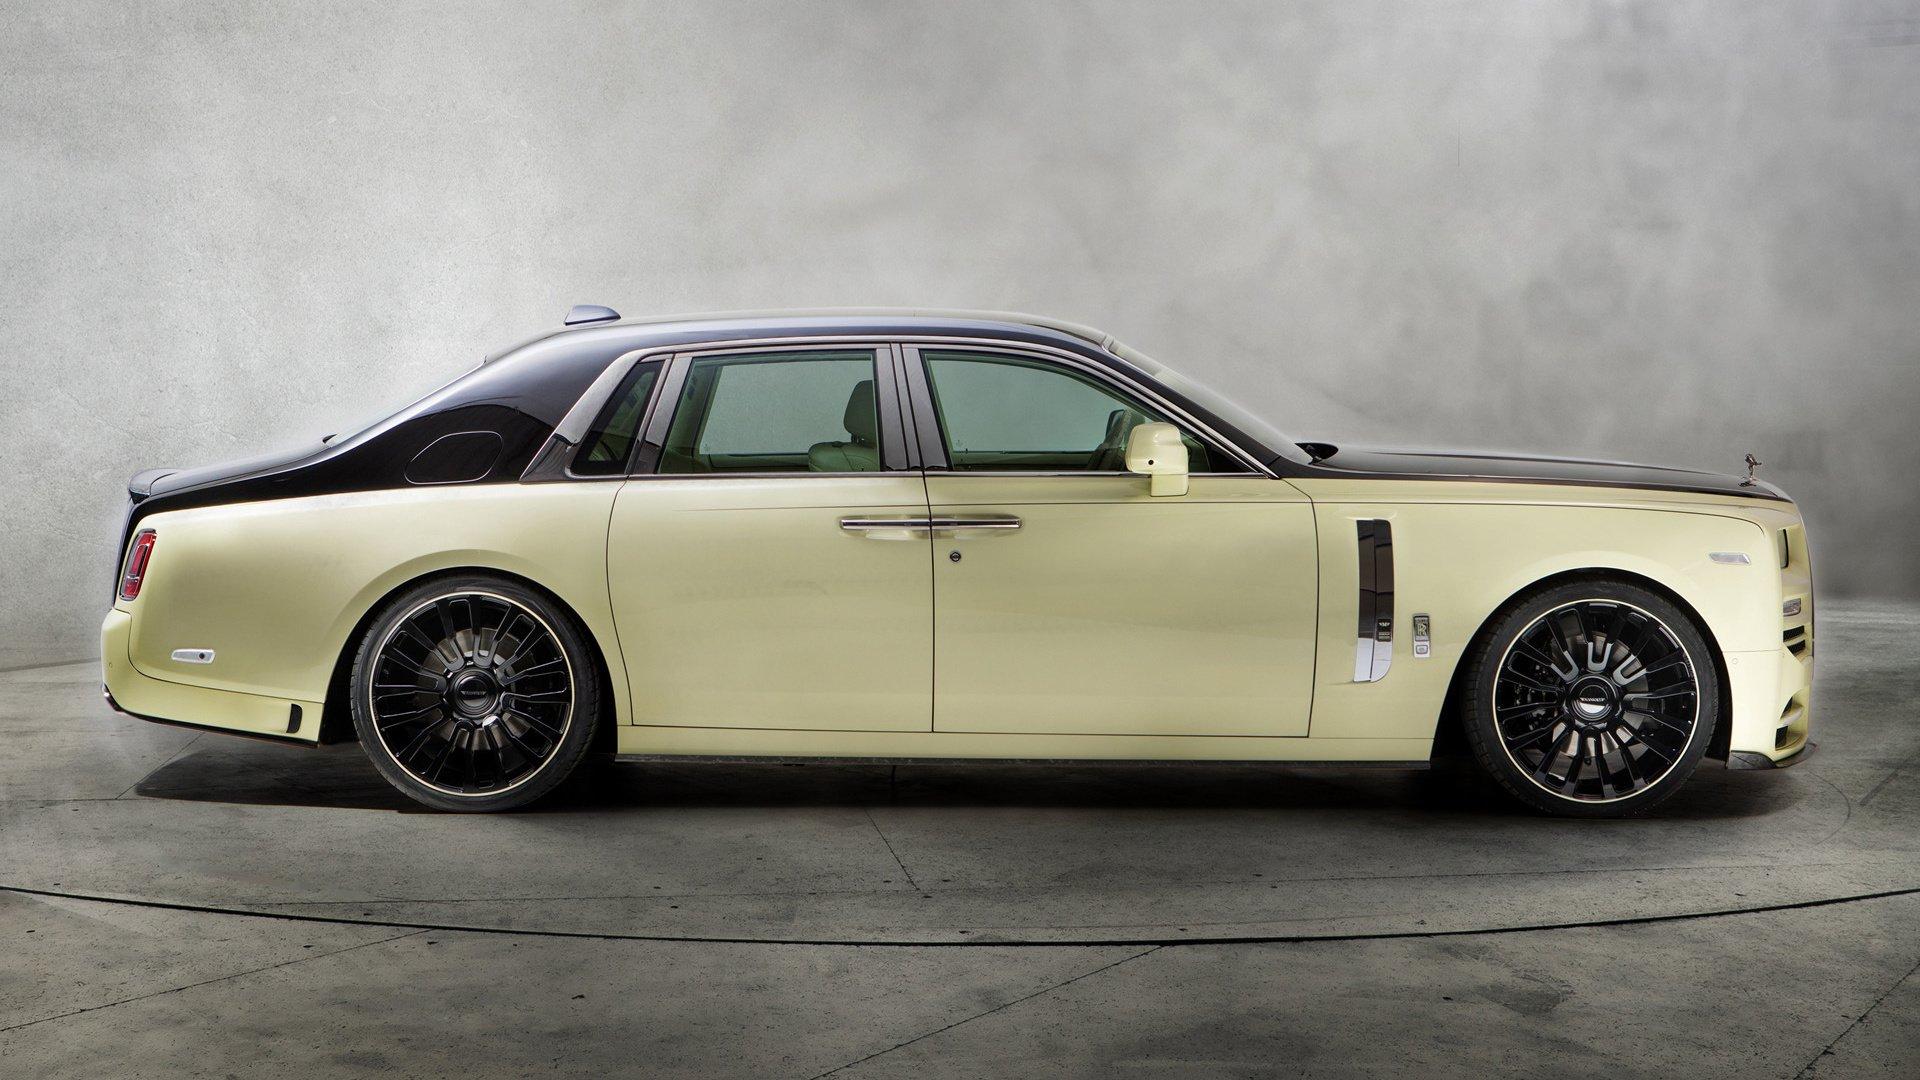 2018 Rolls Royce Phantom Bushukan Edition By Mansory Hd Wallpaper